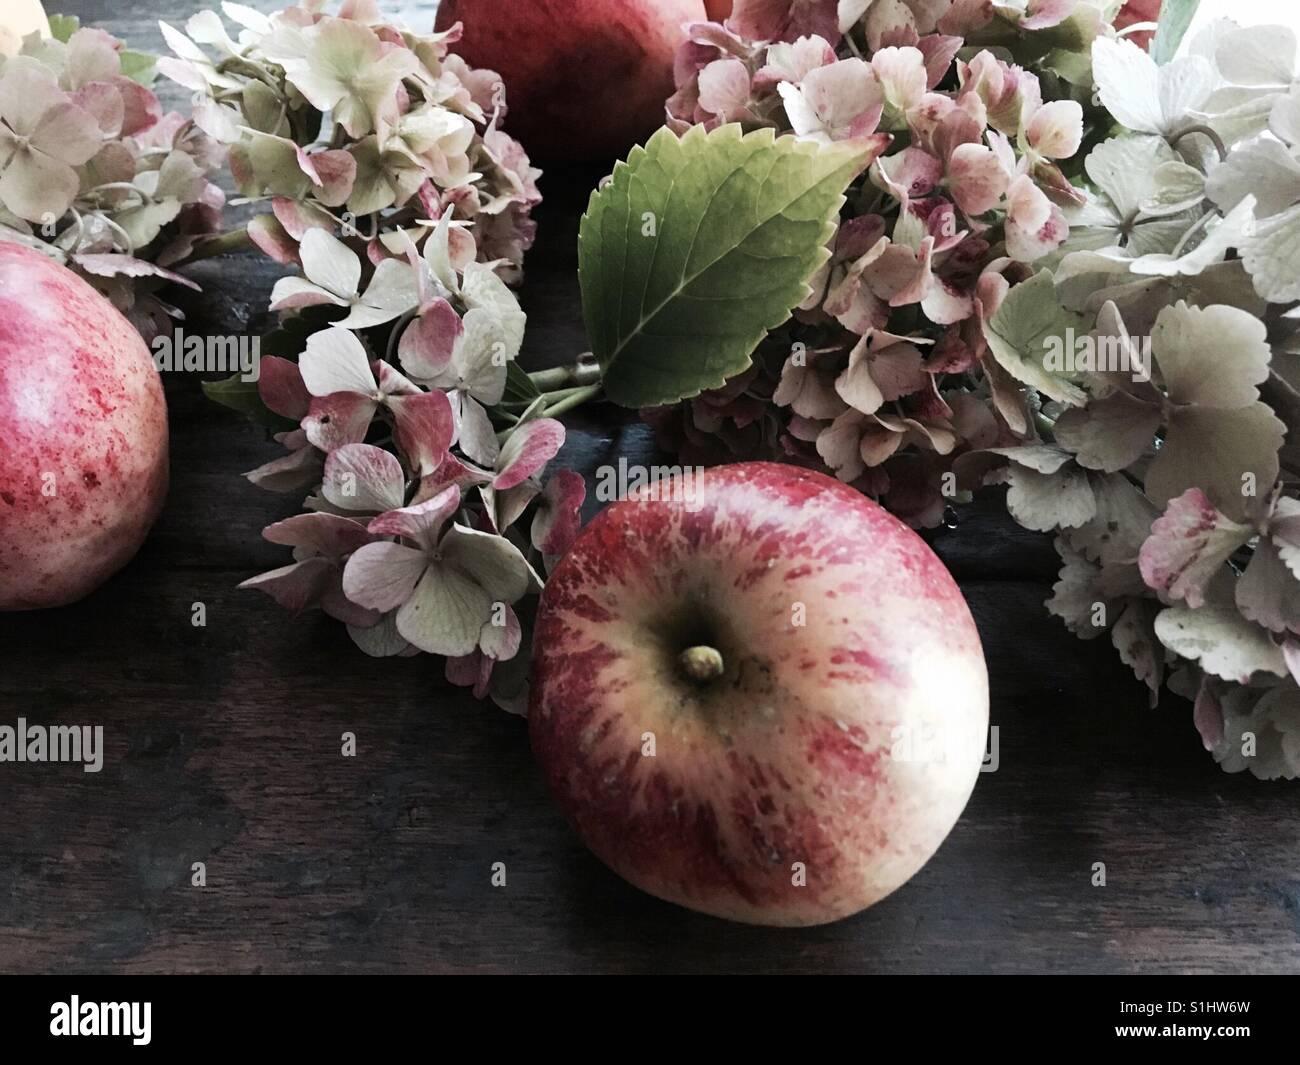 Autumn apple and hydrangeas - Stock Image